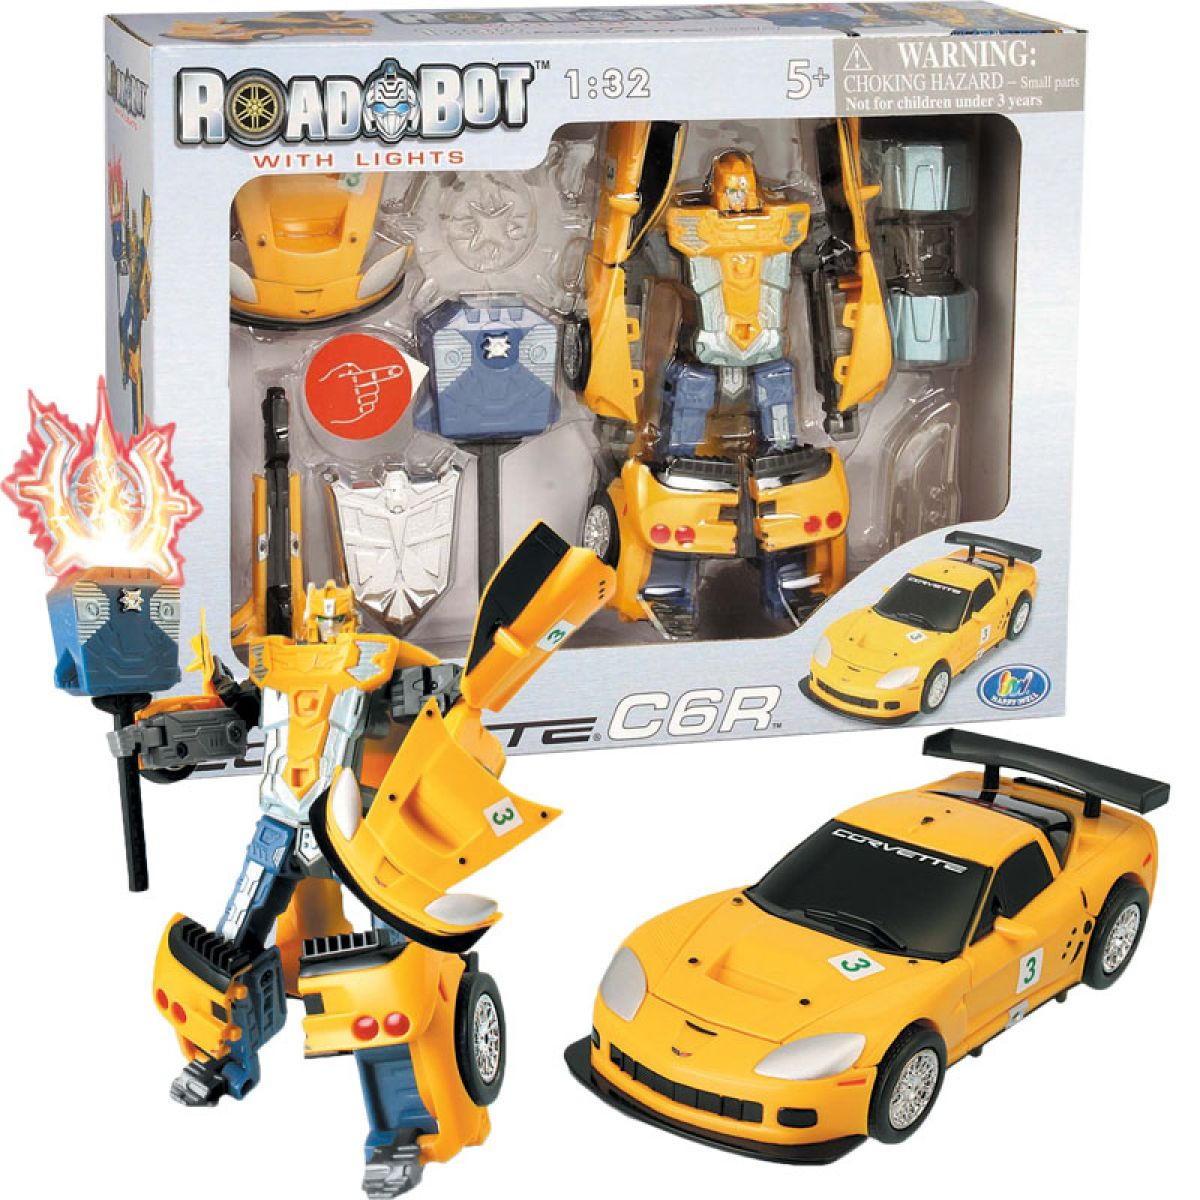 Road Bot Corvette C6R 1:32